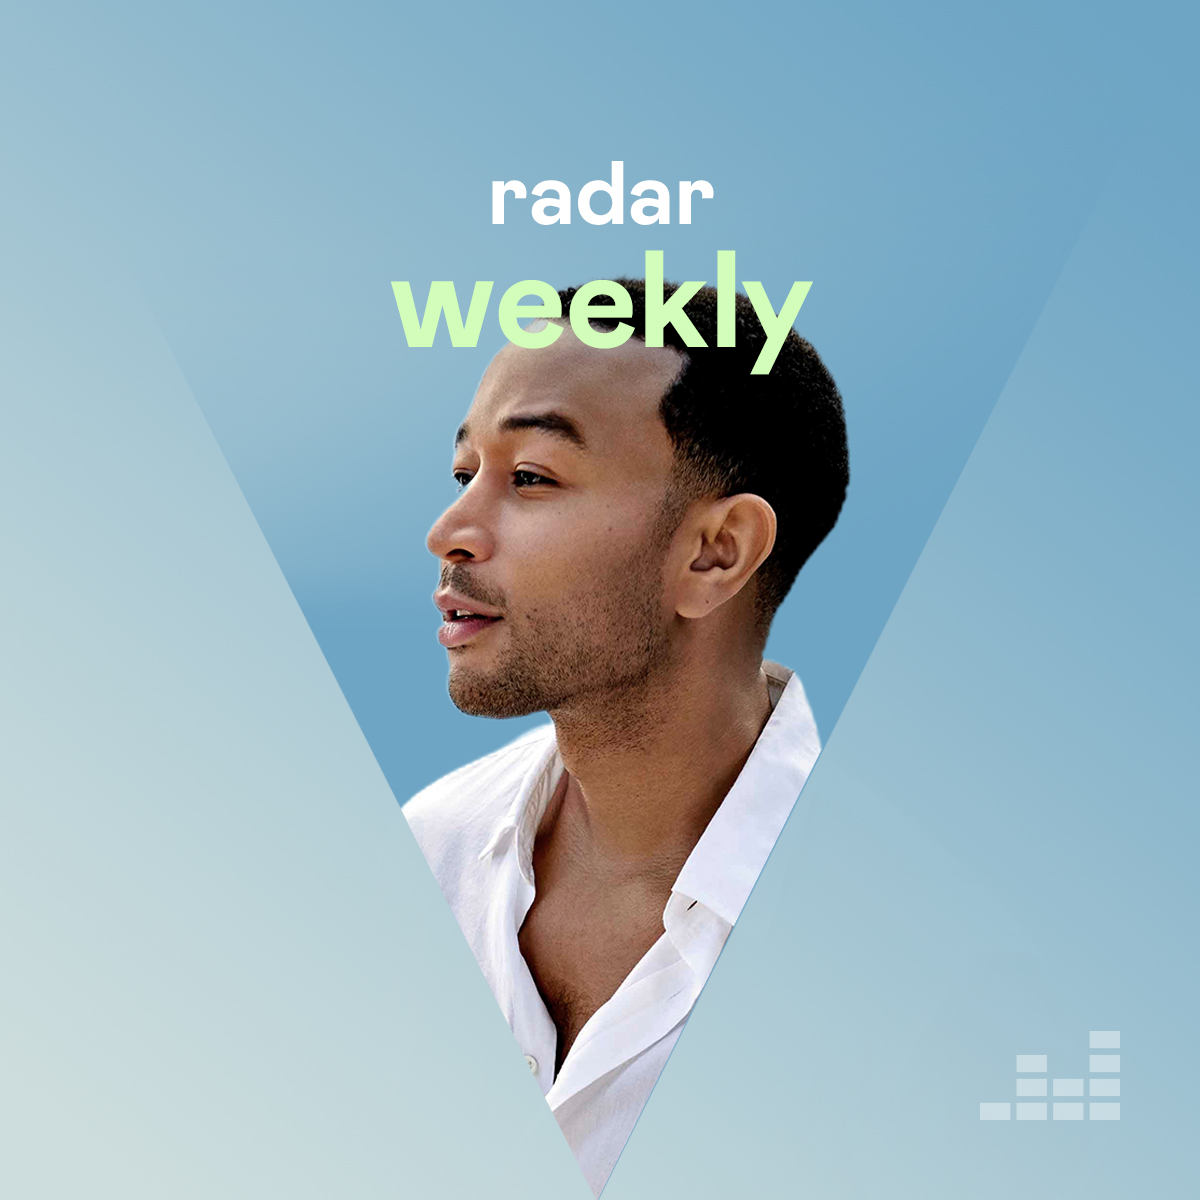 "Listen to my new song ""U Move, I Move"" featuring @JheneAiko on @deezer's Radar Weekly playlist #BiggerLove deezer.lnk.to/RadarWeekly"